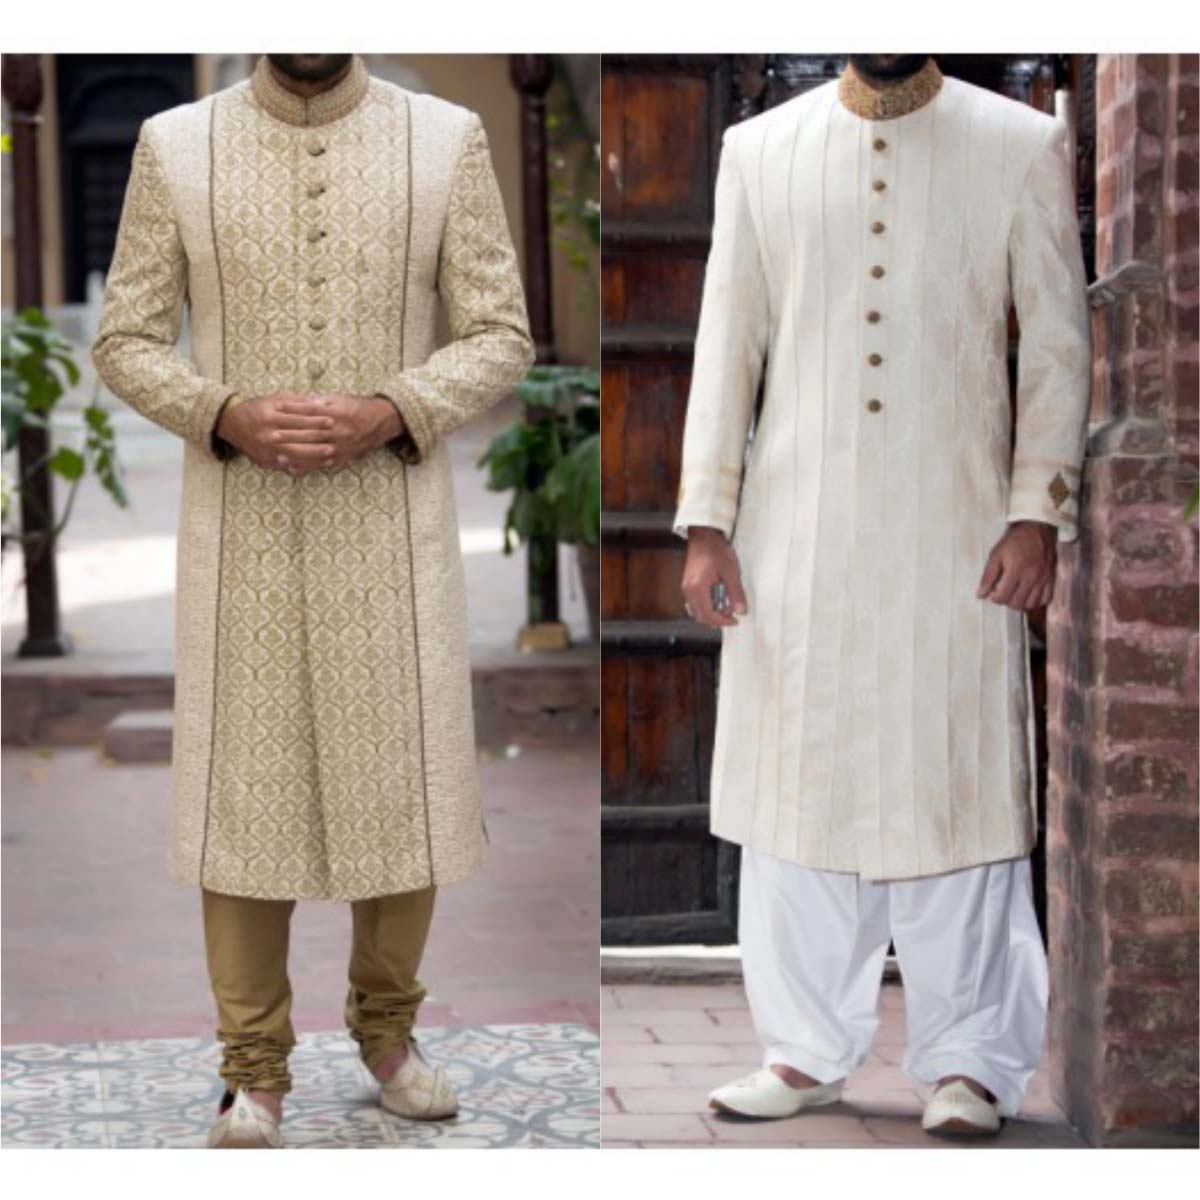 j-j-junaid-jamshed-shwerwanis-design-for-groom-2016-2